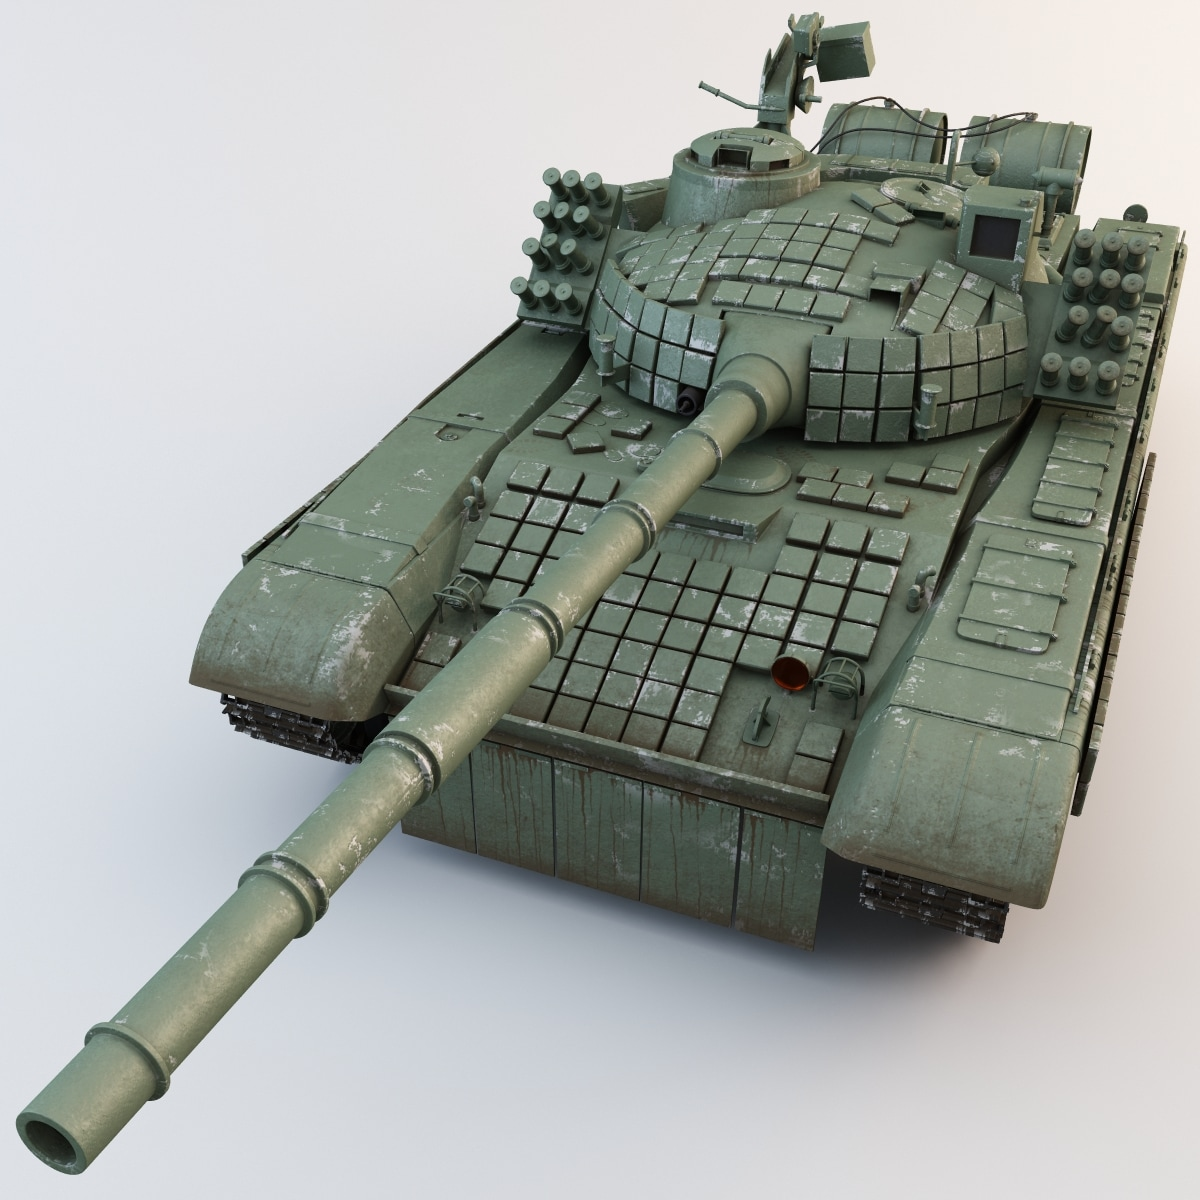 Polish_Main_Battle_Tank_PT-91_Twardy_2_005.jpg